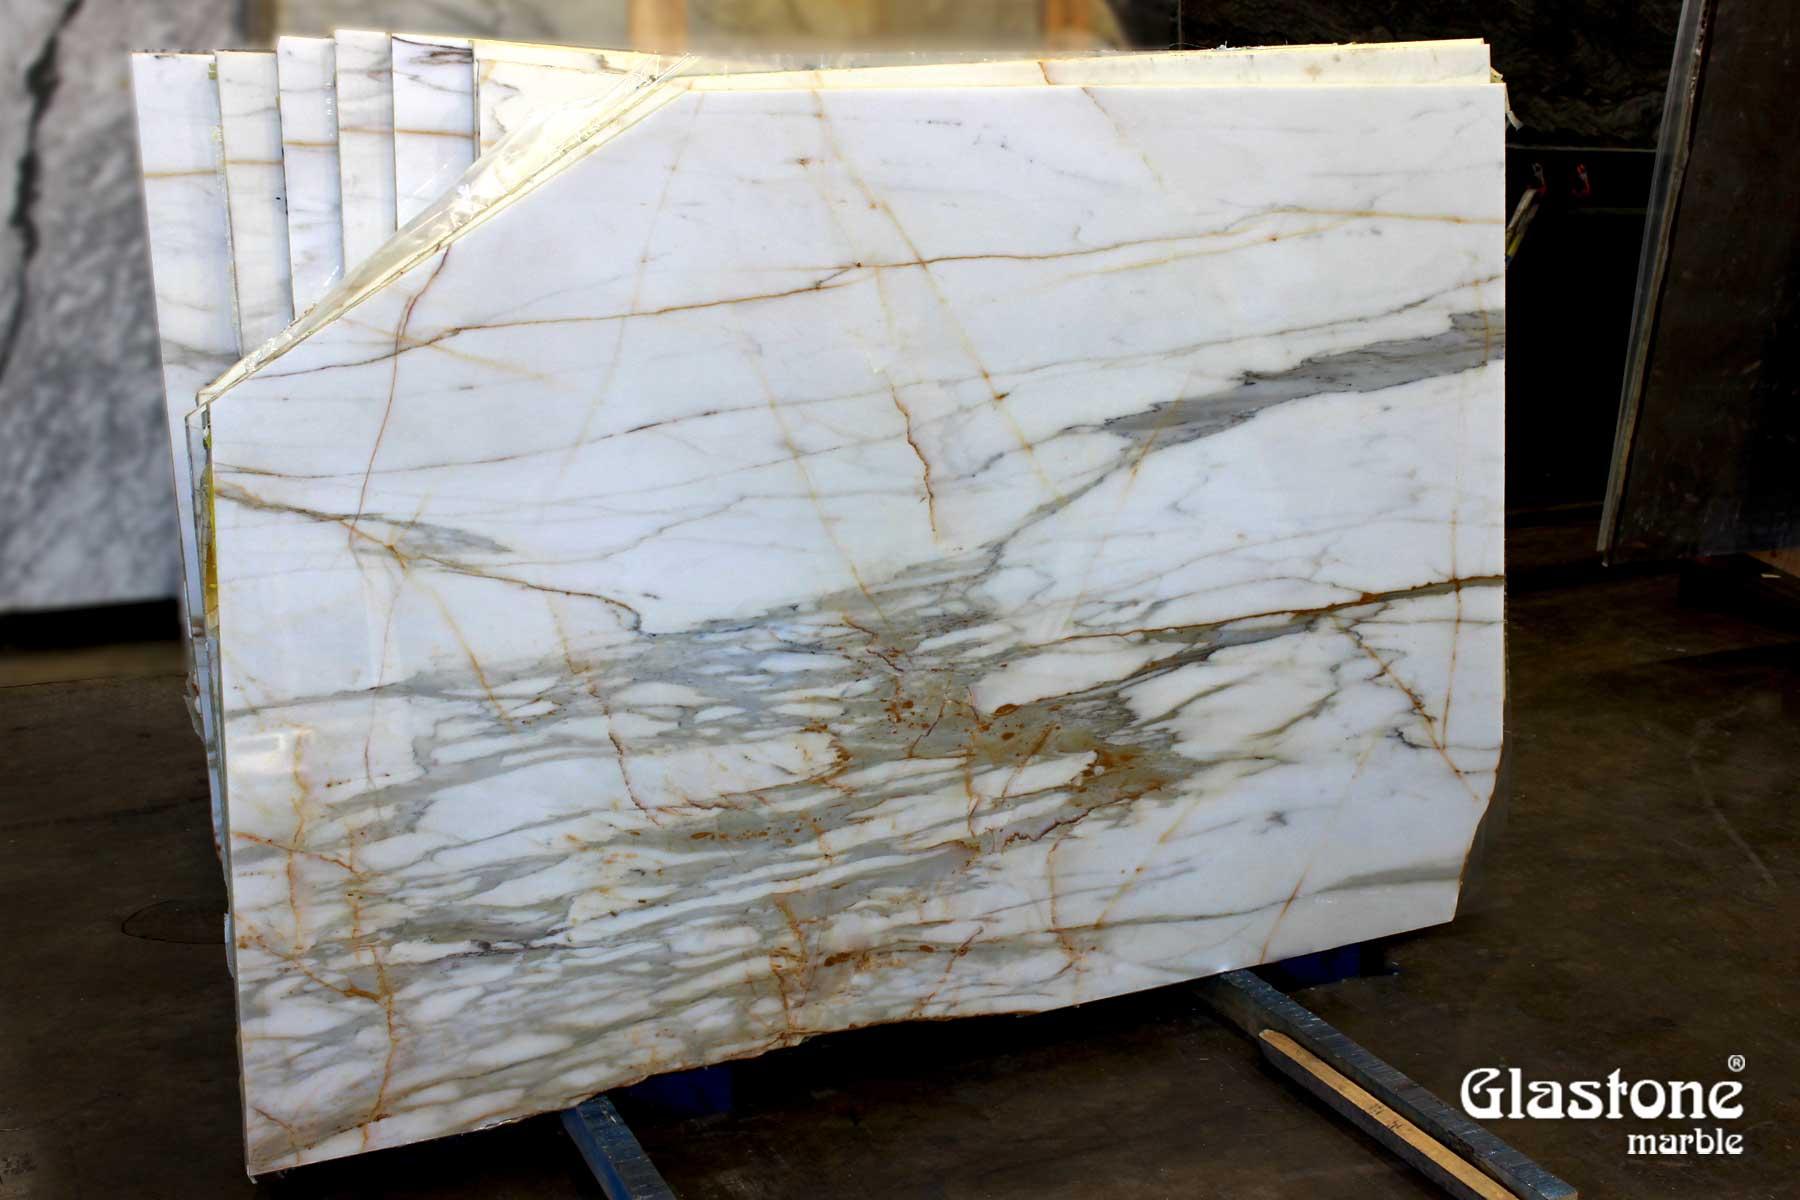 glastone marble marmol solerialaminado vidrio marmol natural calacatta oro